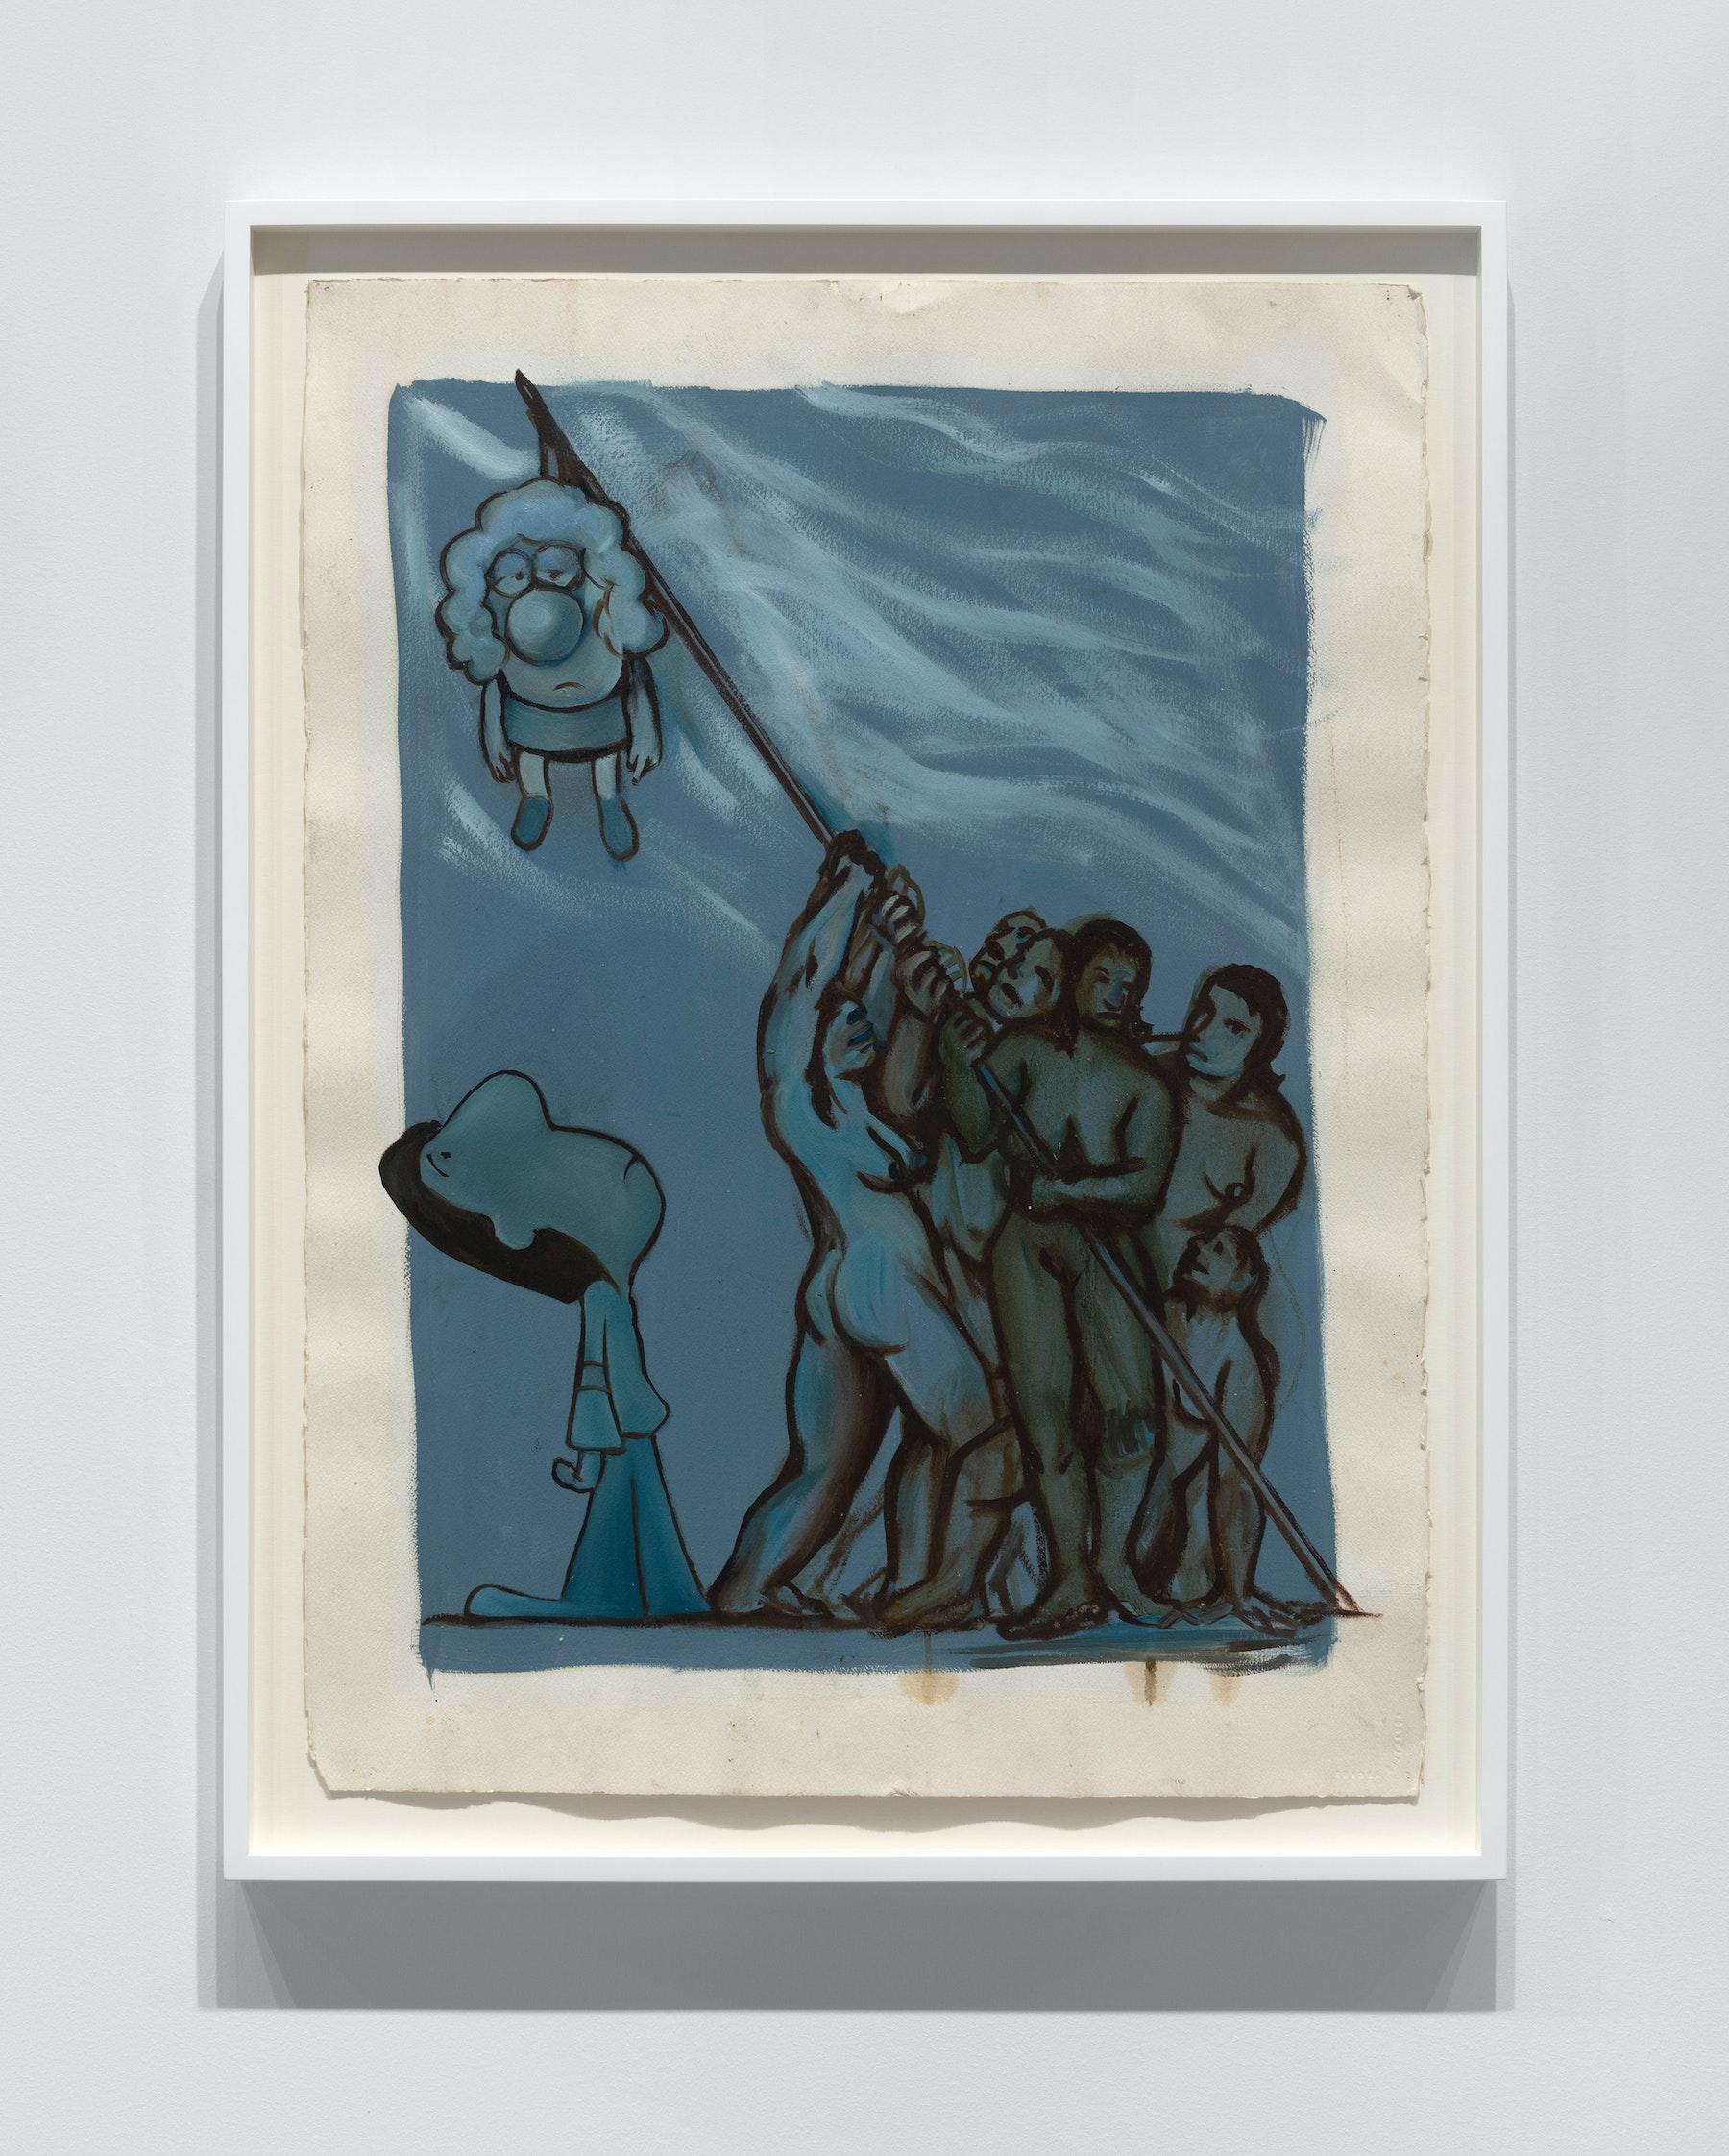 "Nicole Eisenman ""Momma,"" 1996 Oil on paper 30"" x 22"" [HxW] (76.2 x 55.88 cm) Inventory #EIS592 Courtesy of the artist and Vielmetter Los Angeles Photo credit: Steven Probert"